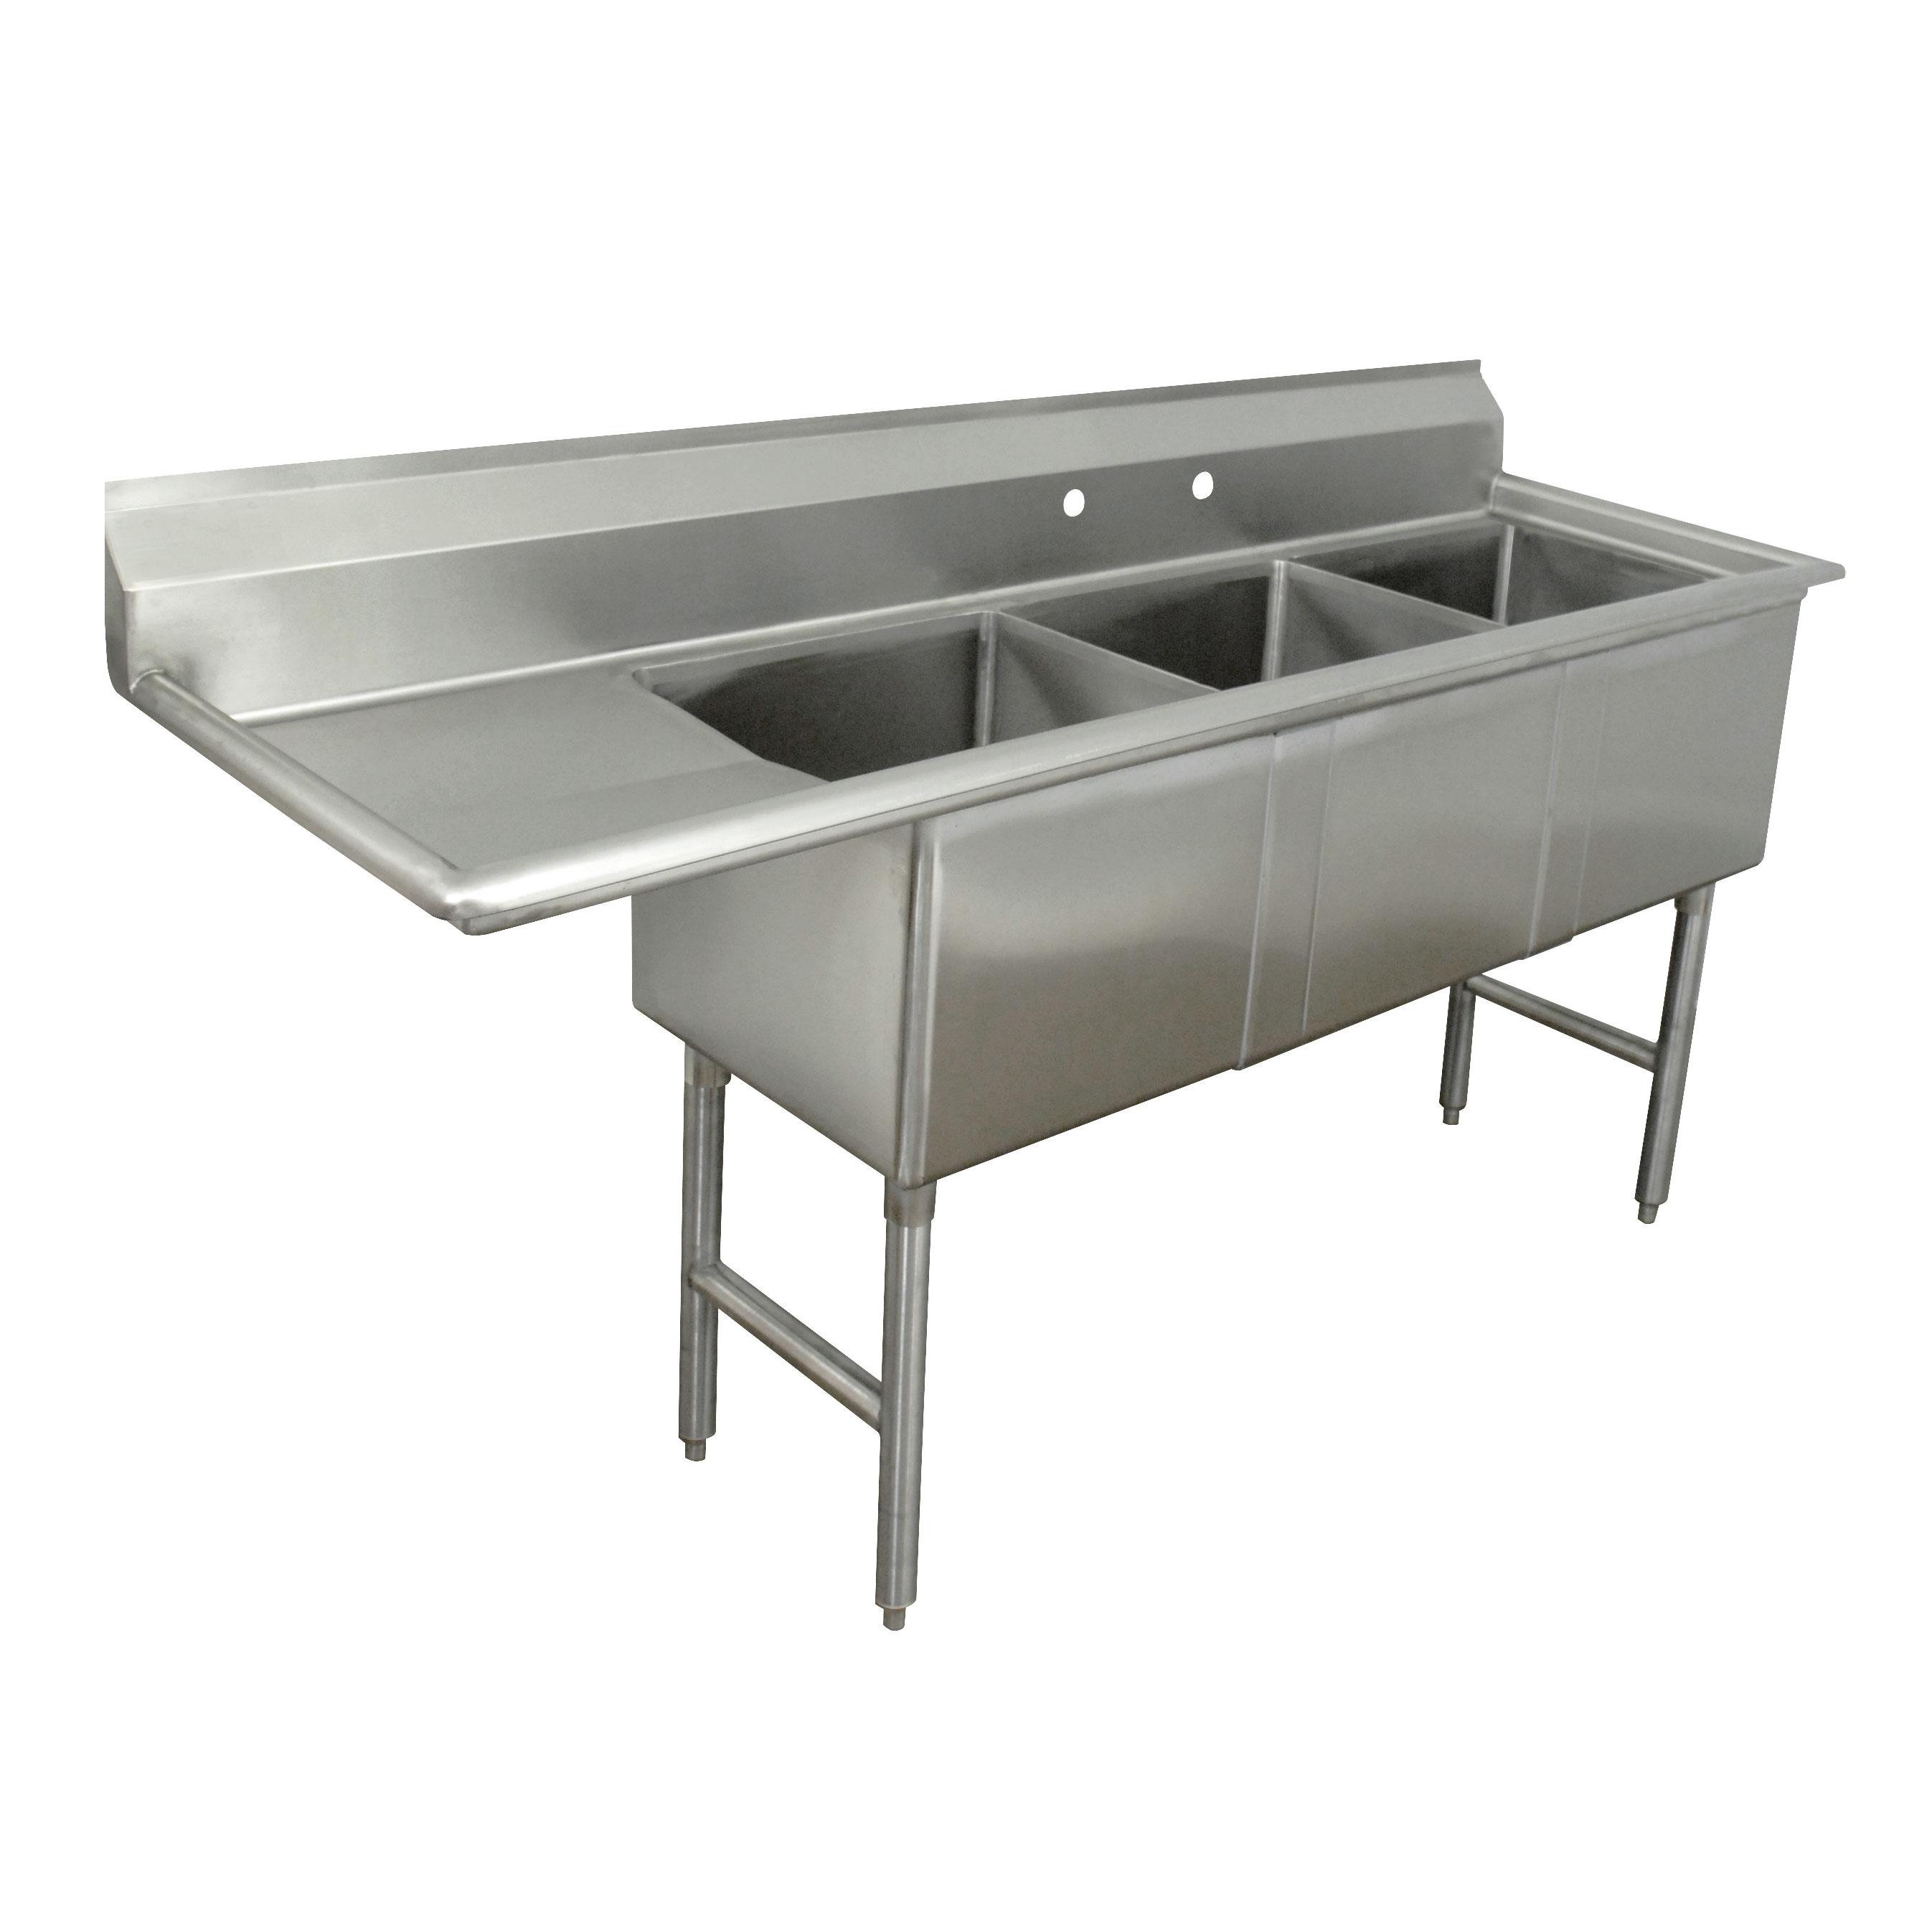 Advance Tabco FC-3-3024-36L sink, (3) three compartment